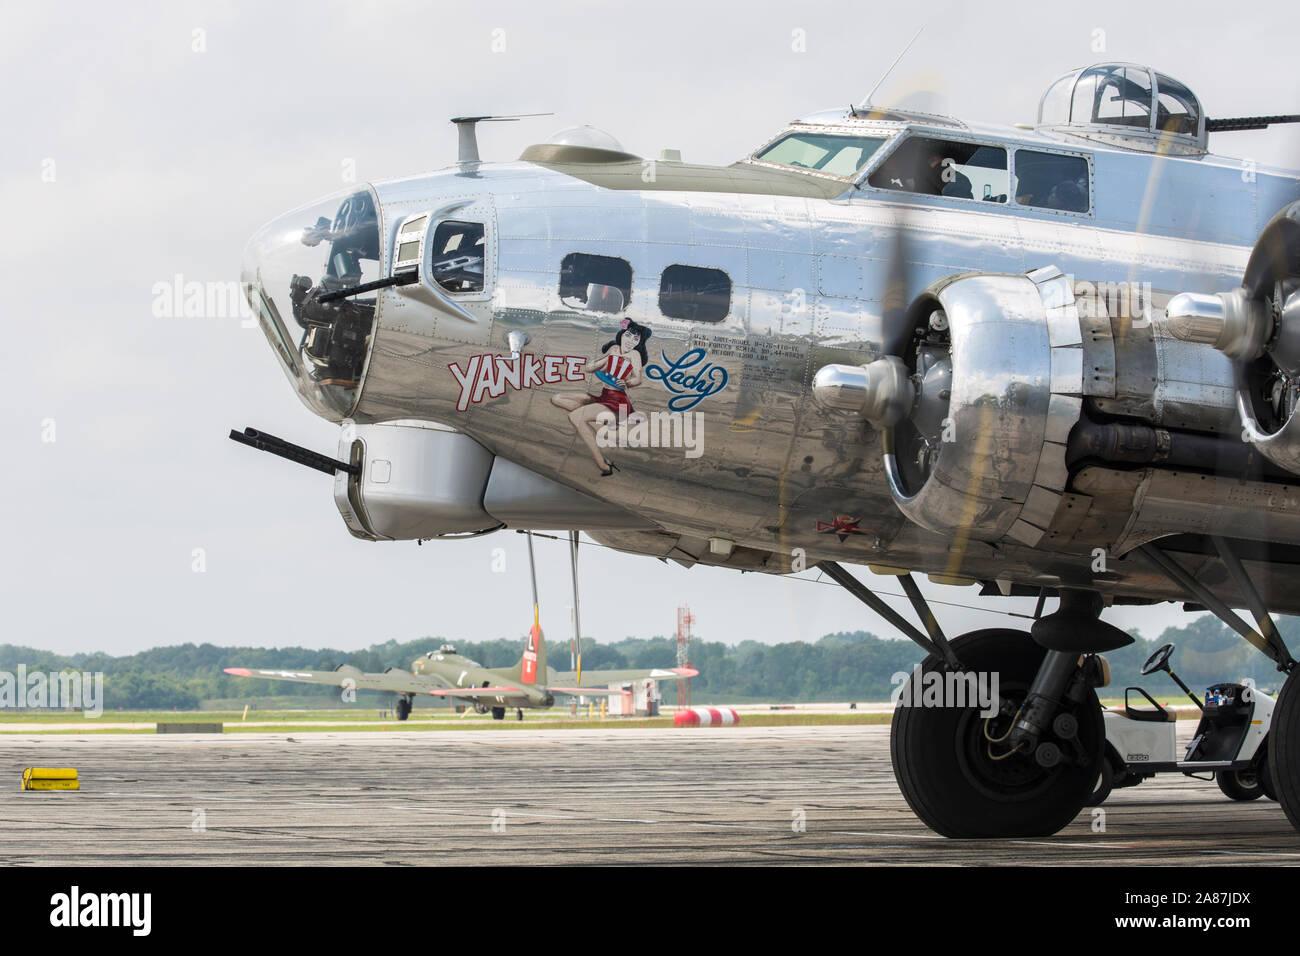 YPSILANTI, MICHIGAN / USA - August 25, 2018: A World War II era B-17 Flying Fortress at the 2018 Thunder Over Michigan Airshow. Stock Photo